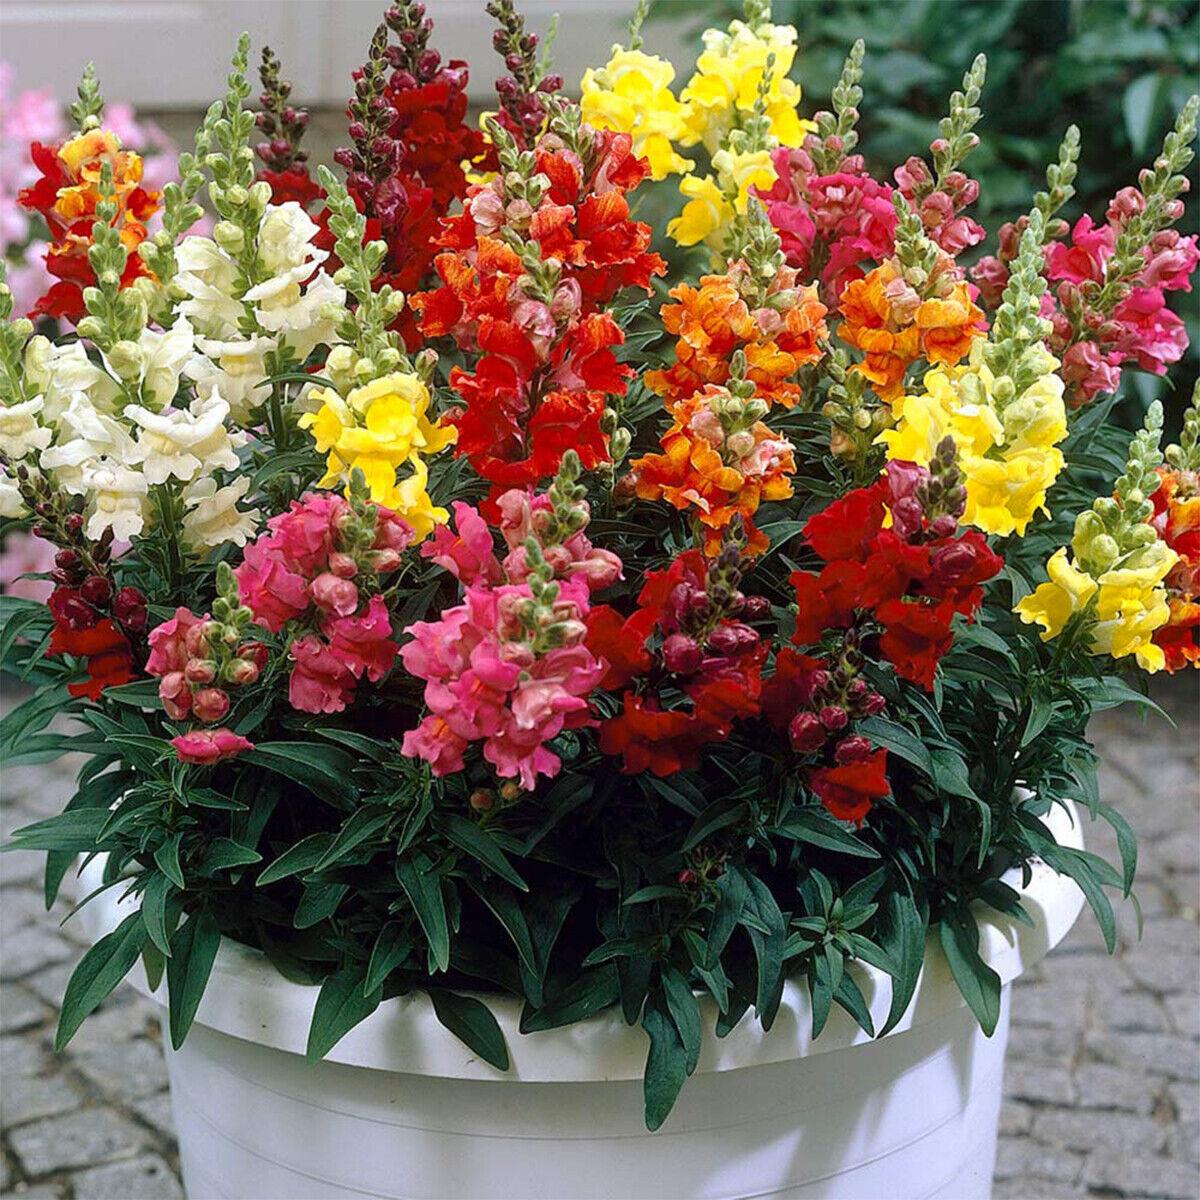 100 Giant Snapdragon Seeds Antirrhinum Majus Mix Colour Border container Flower